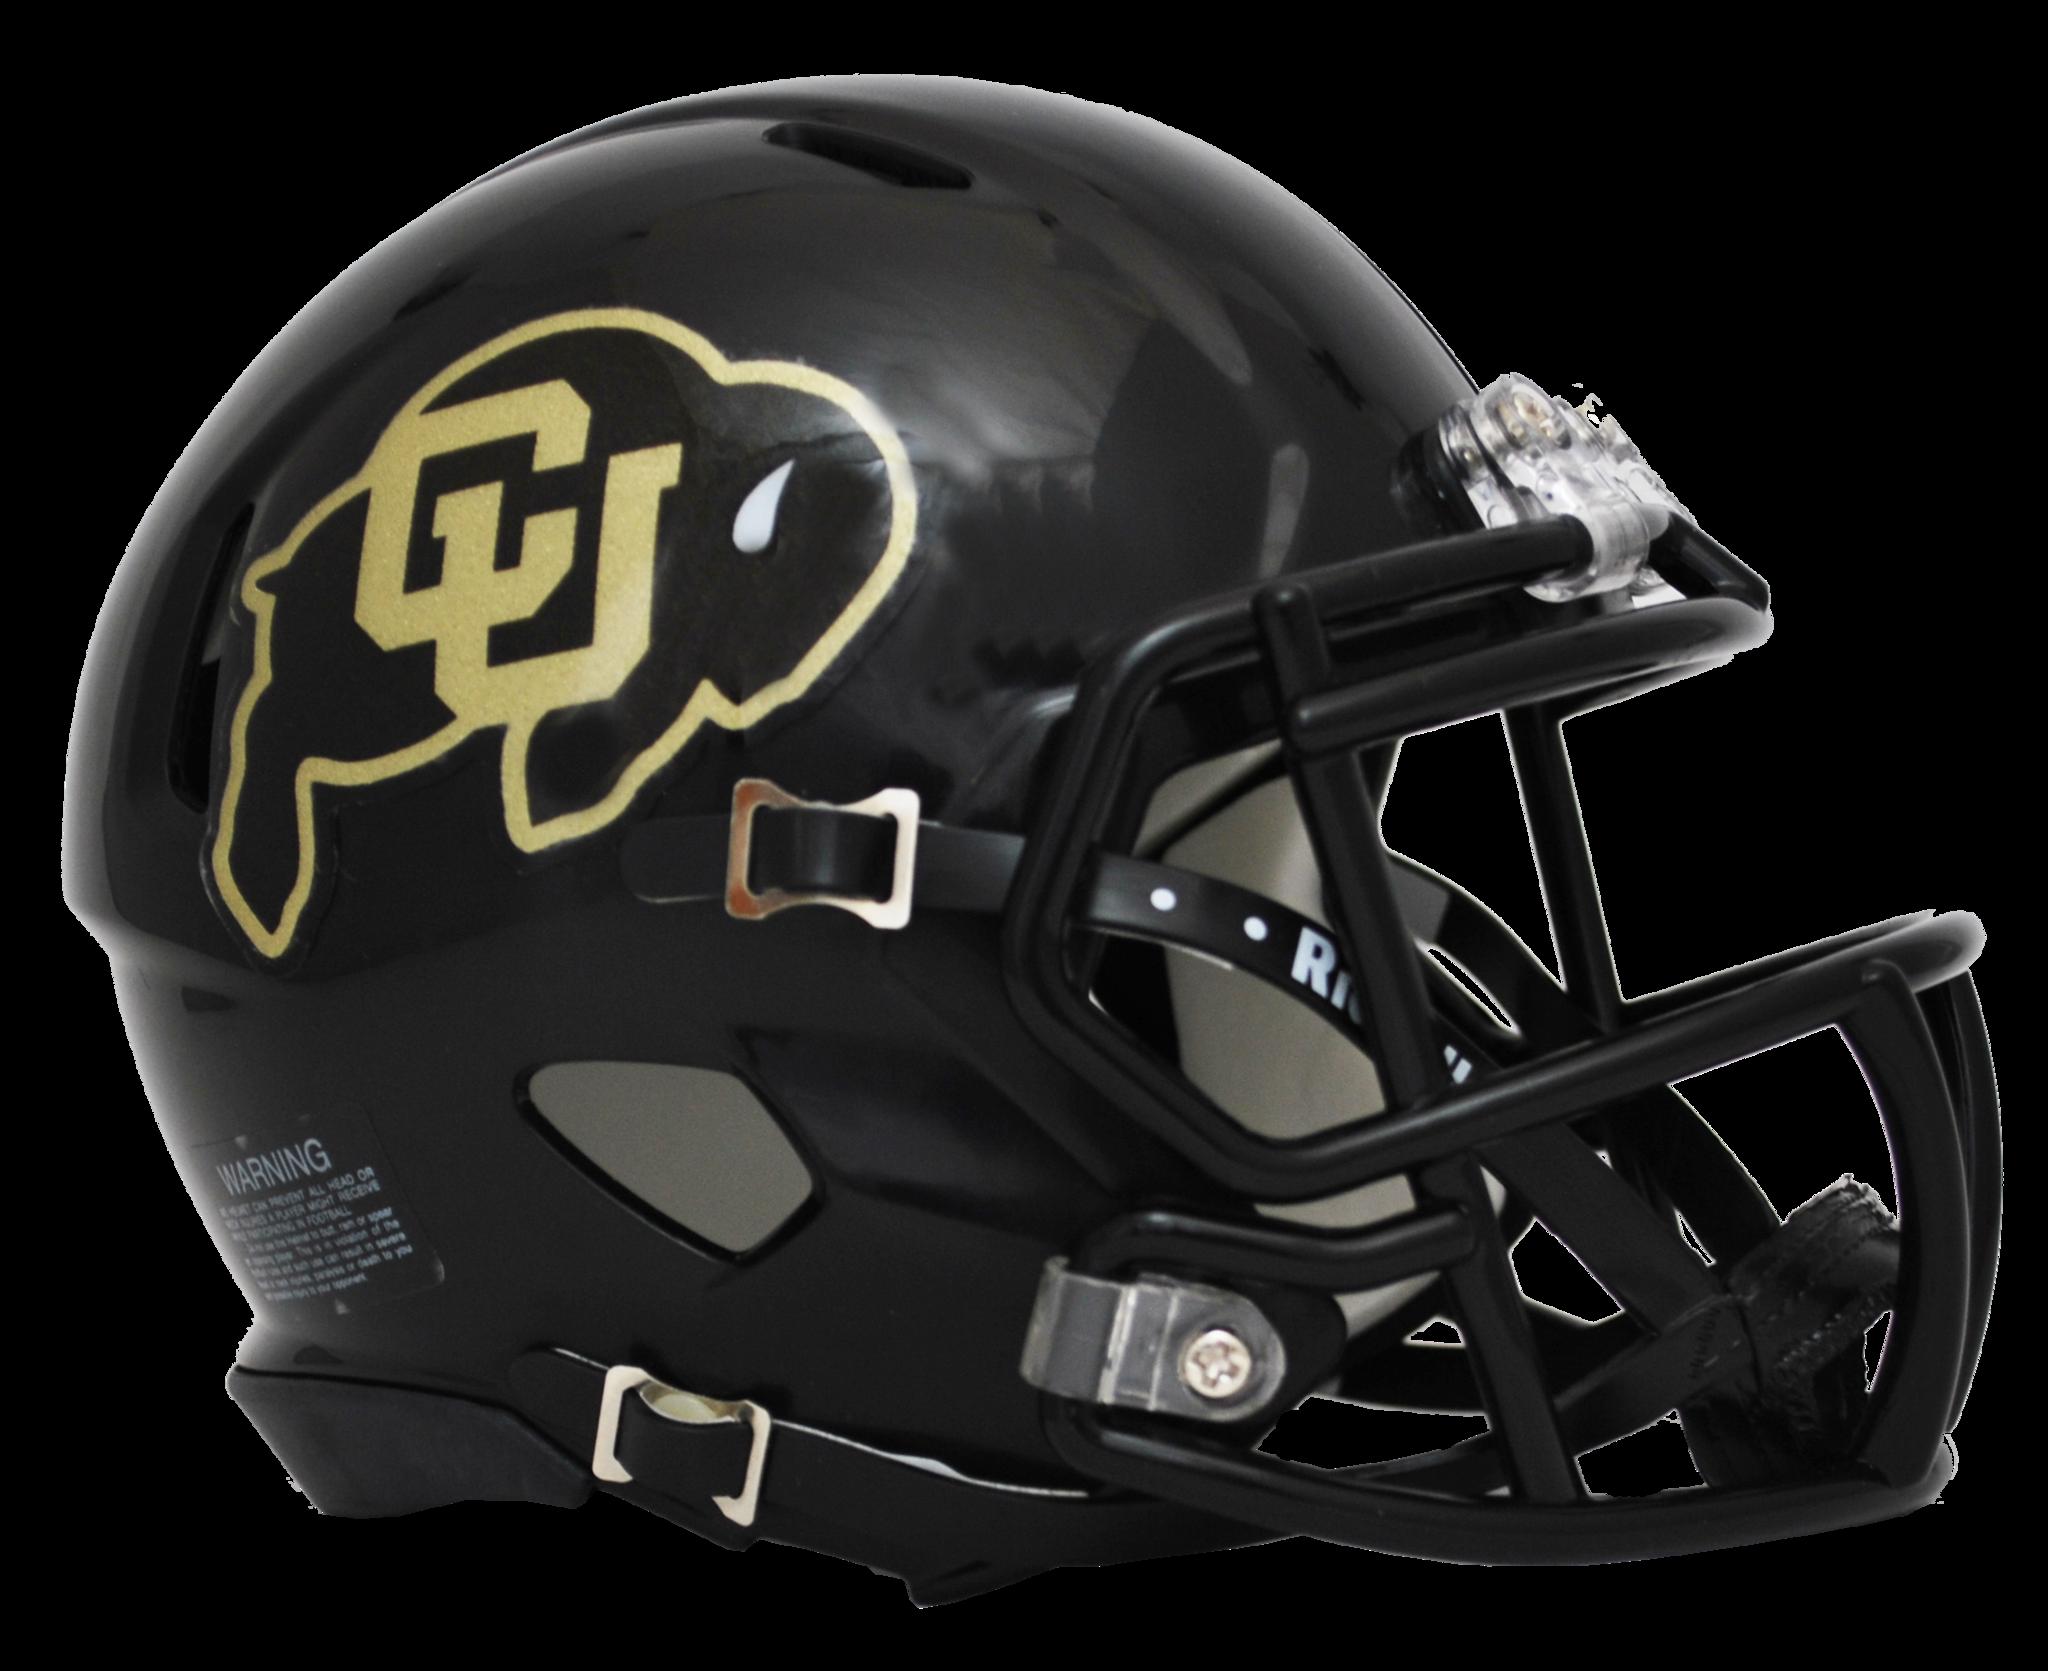 Colorado Buffaloes Black Riddell Mini Speed Helmet By Riddell Game Day Treasures Football Helmets Cool Football Helmets Mini Football Helmet